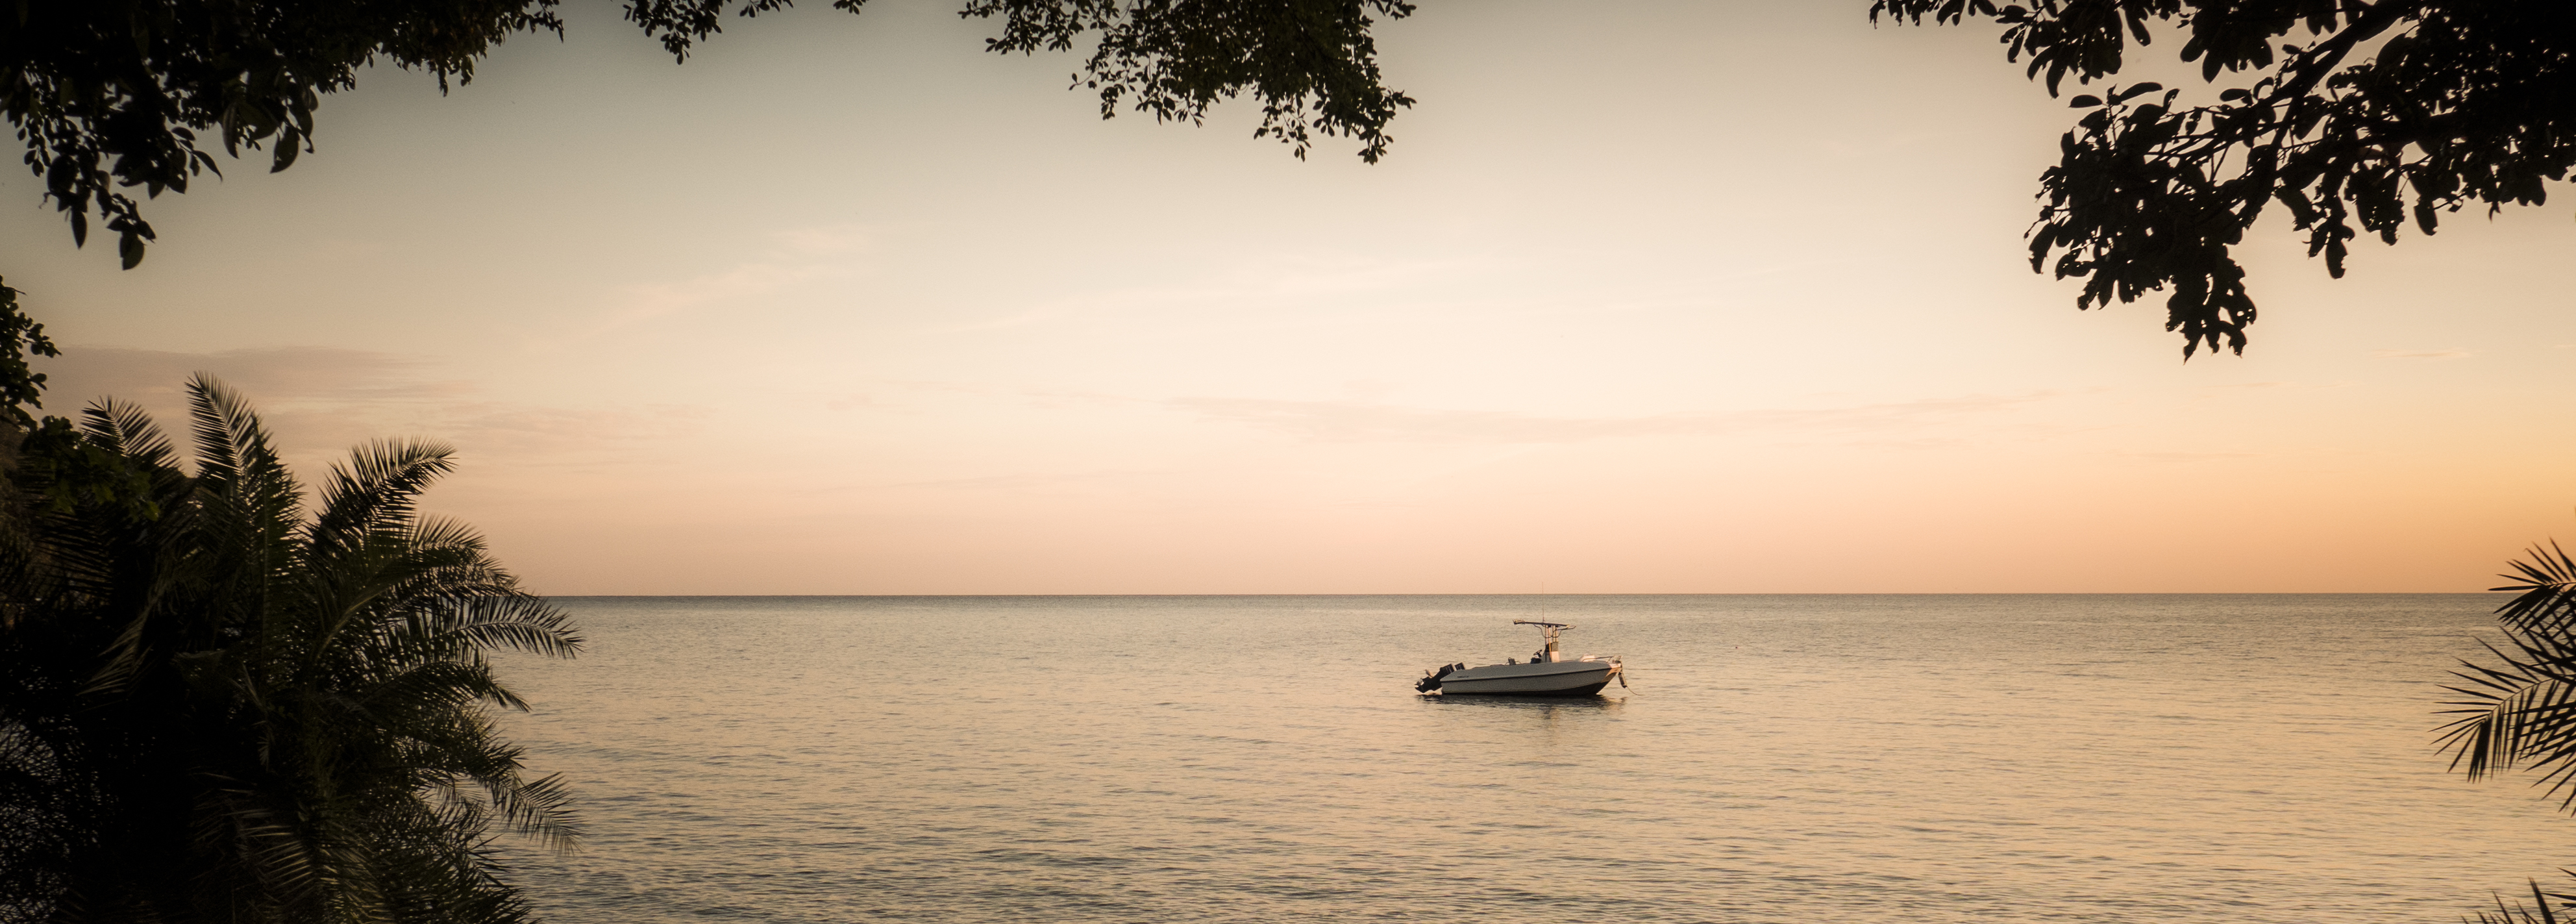 Rubondo-Island-Camp-Sunrise-over-Rubondo-Beach-Eric-Frank-MR